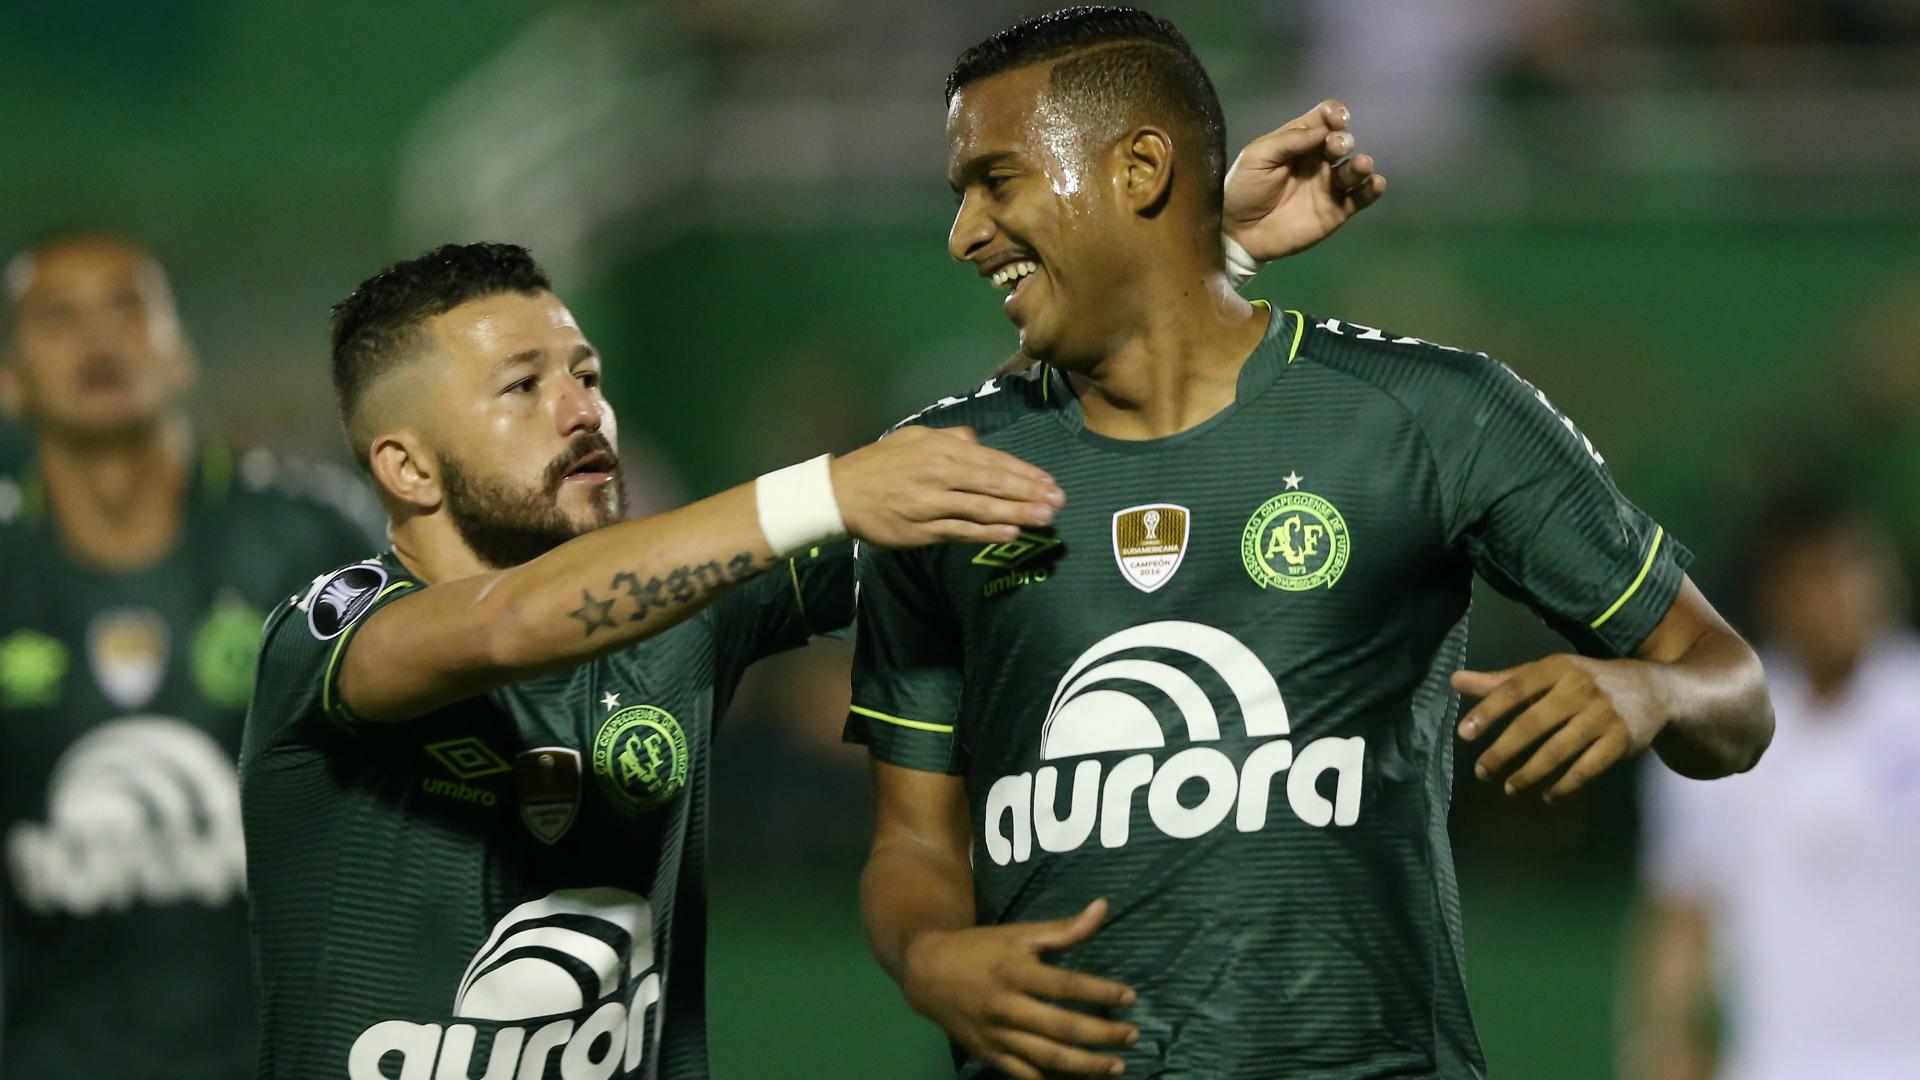 Reinaldo Rossi Chapecoense Nacional Copa Libertadores